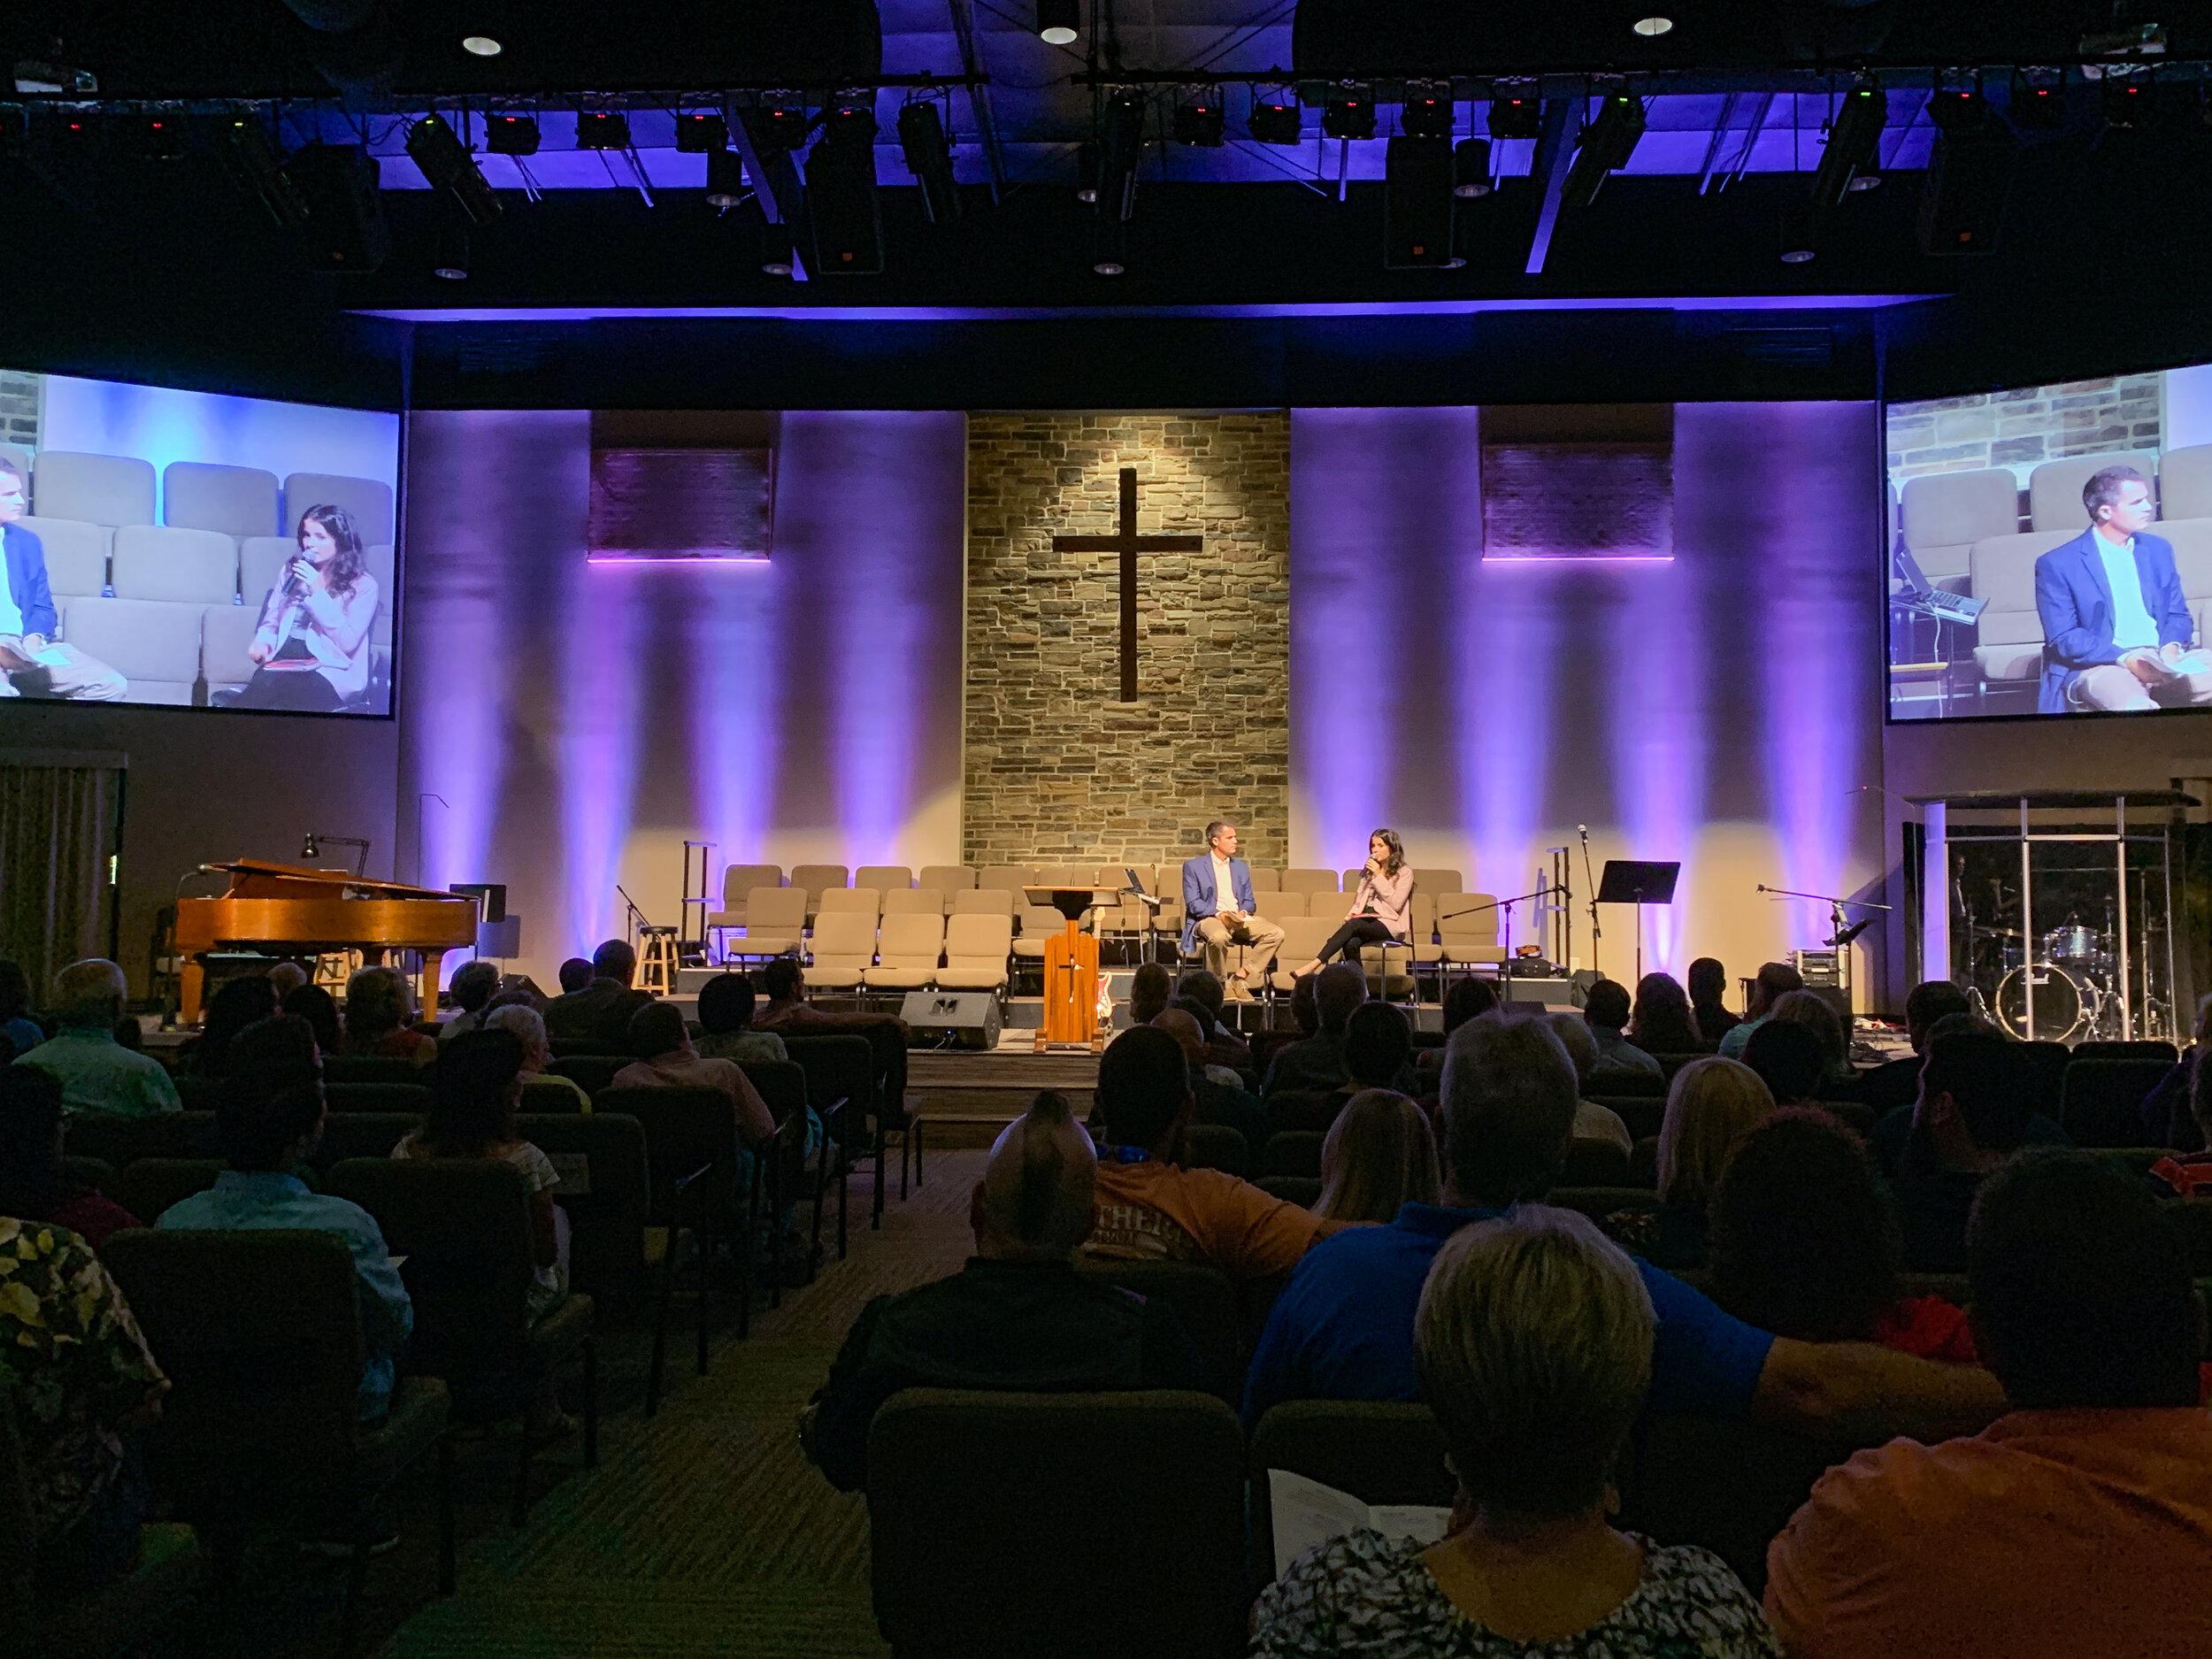 2019 - SPEAKING AT SOUTHWEST CHRISTIAN CHURCH